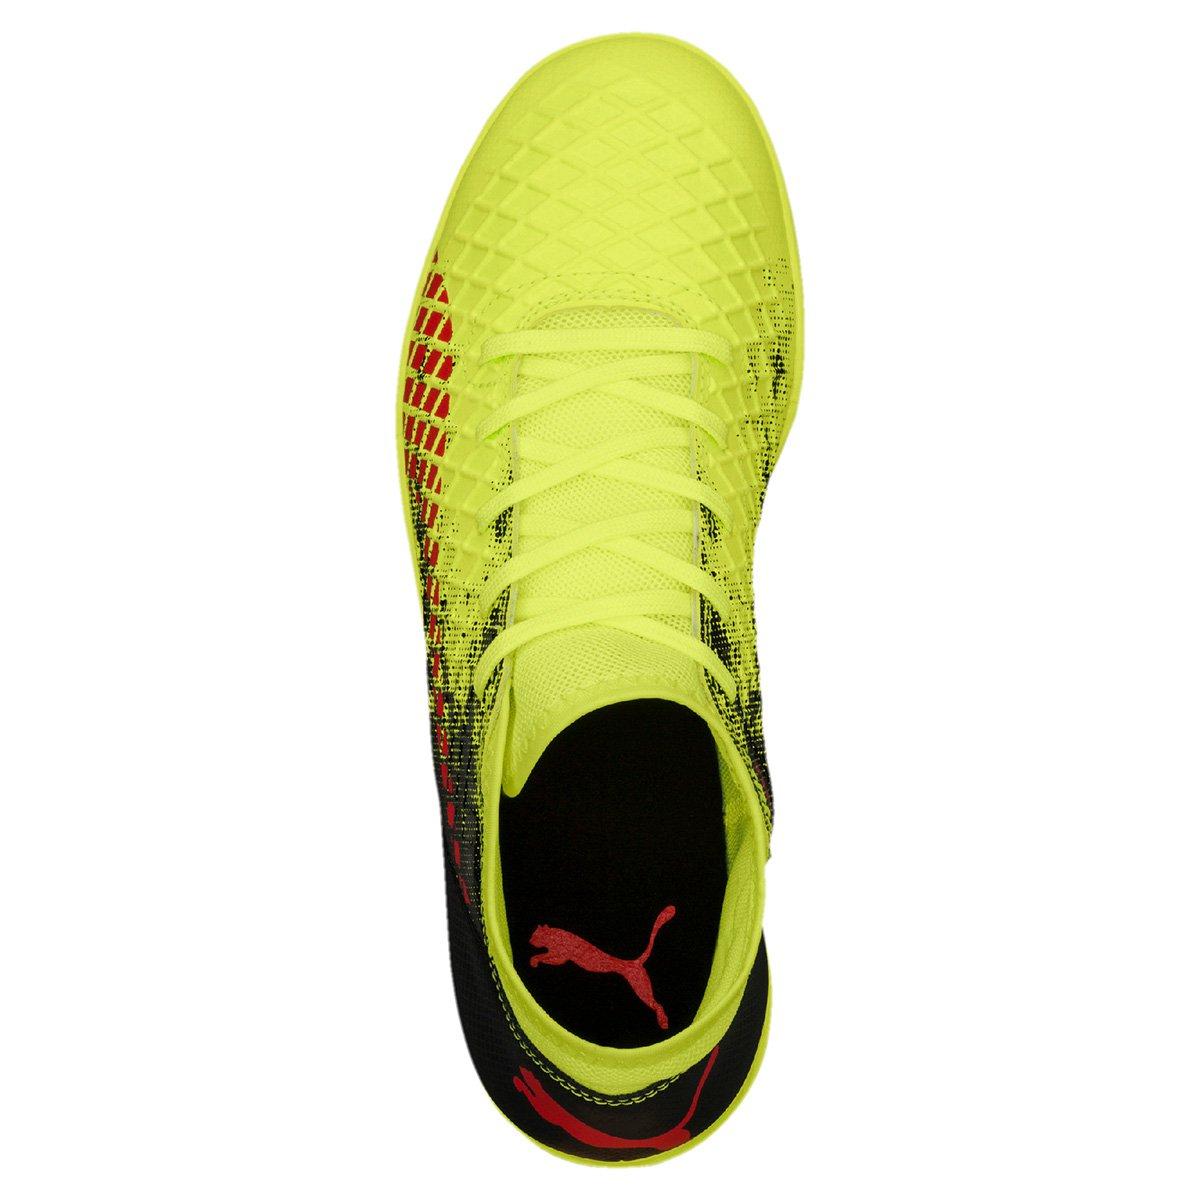 Chuteira Futsal Infantil Puma Future 18.4 IT - Compre Agora  da9d9e54513c2